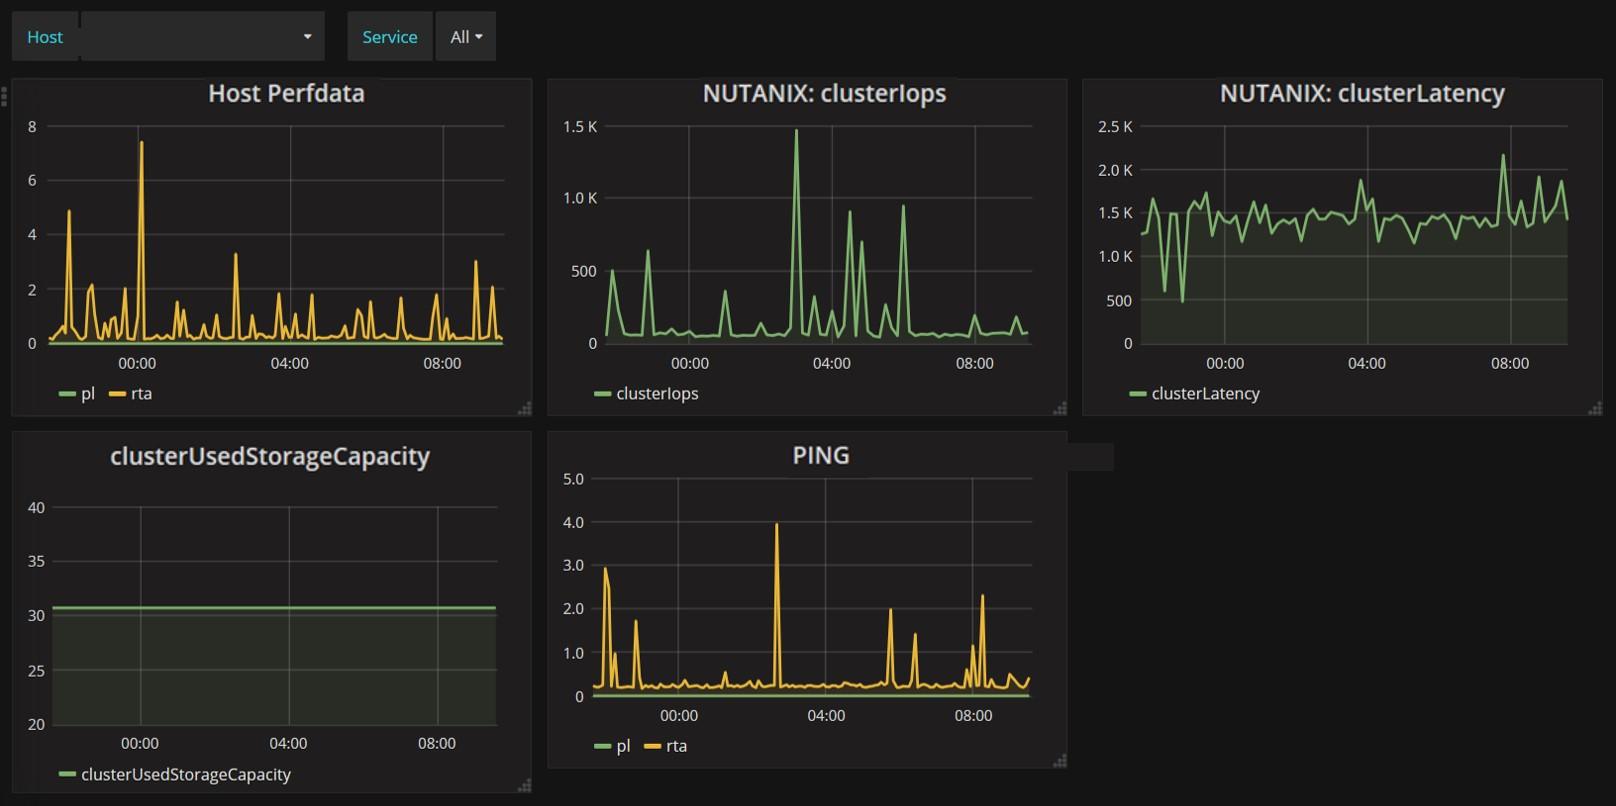 Nutanix Monitoring with NetEye | www neteye-blog com